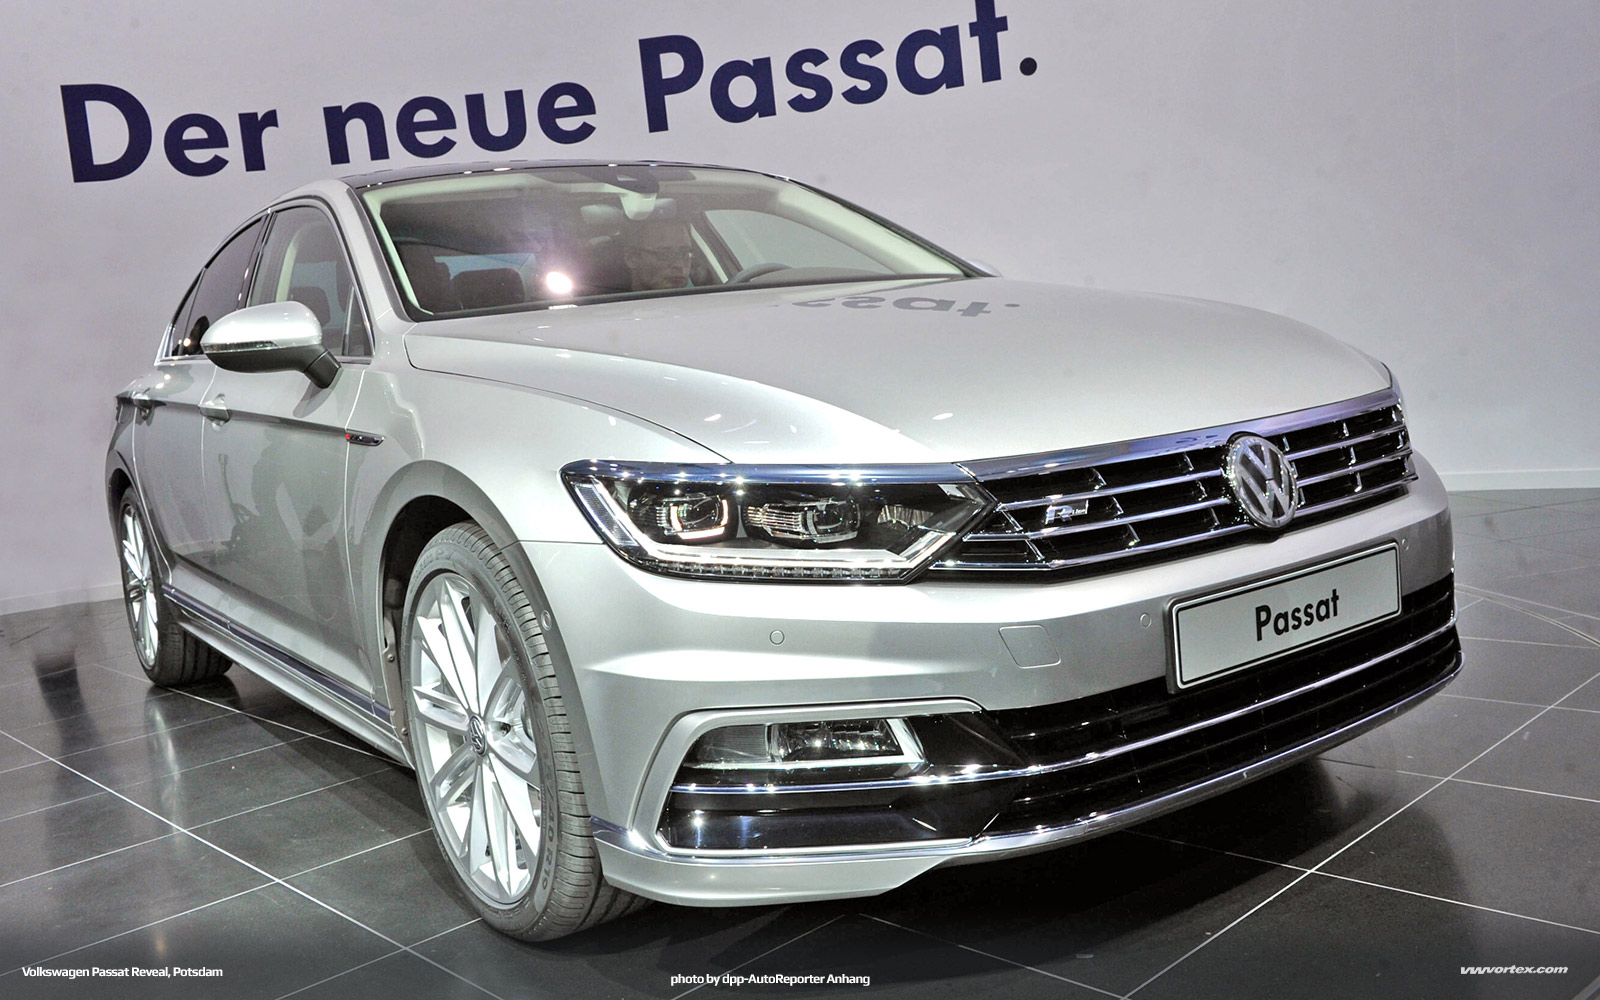 2014 Volkswagen Passat VIII MQB Reveal Potsdam 652 600x375